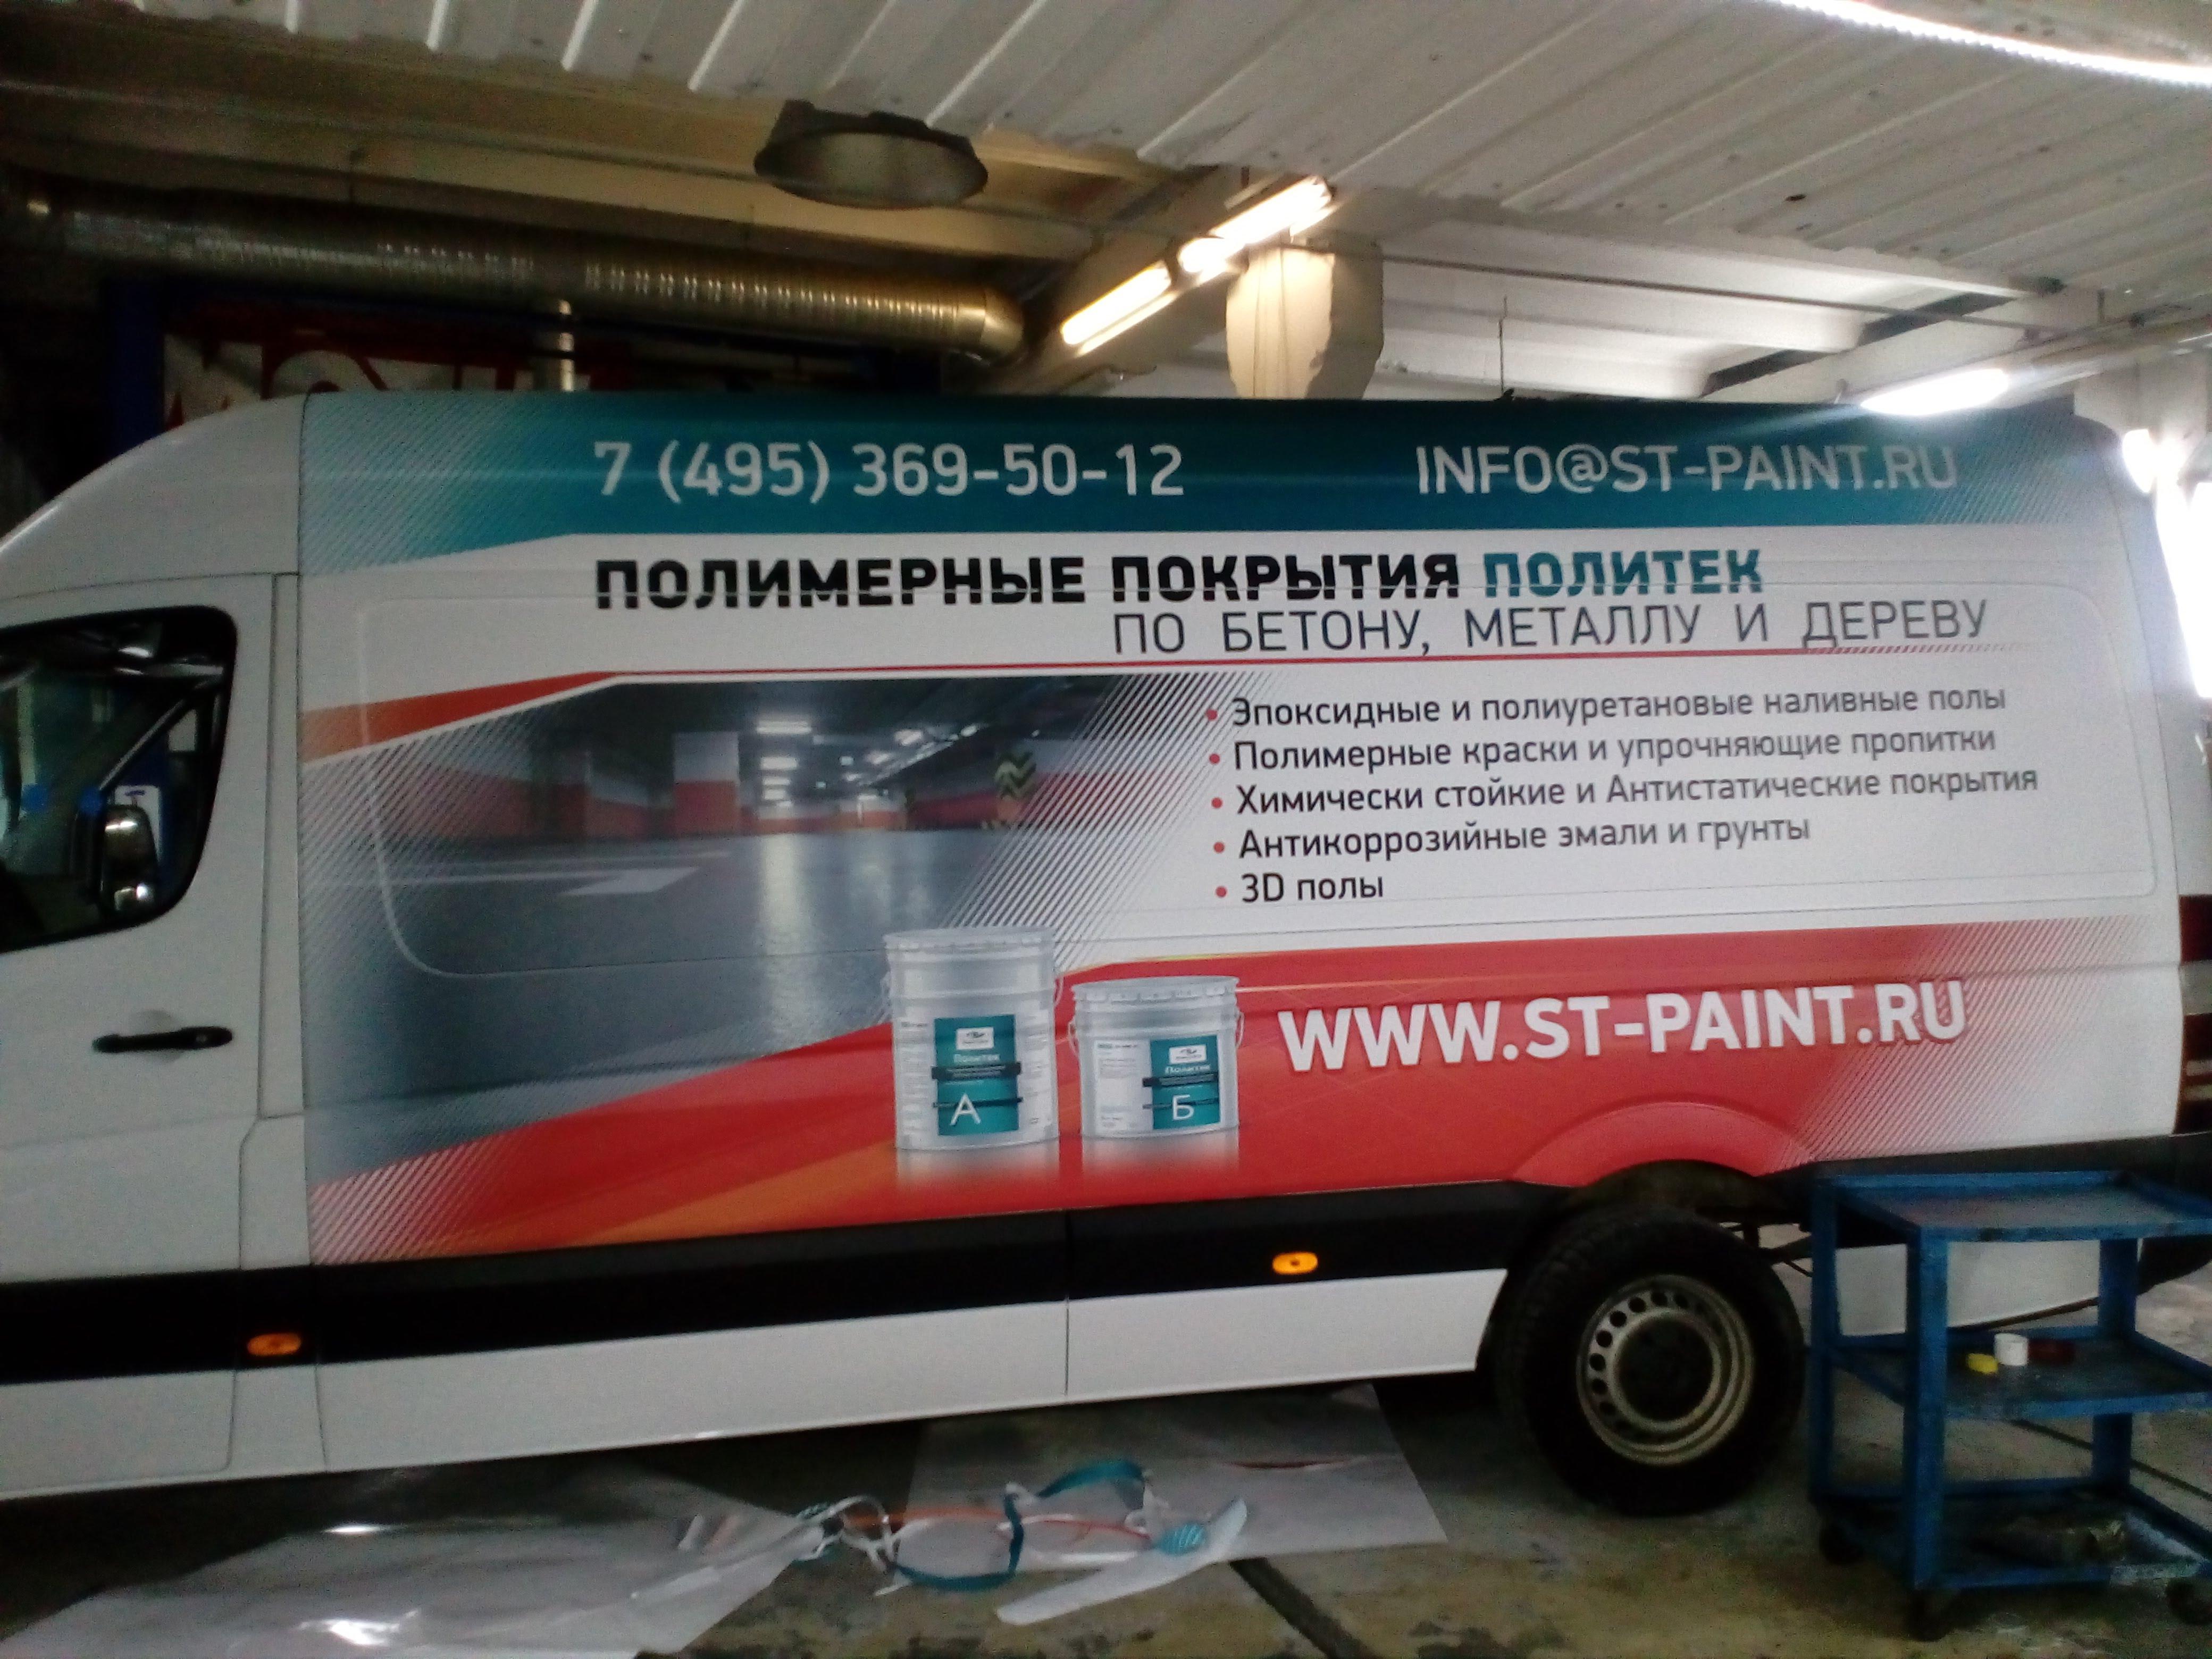 Рекламная оклейка микроавтобуса Mersedes Srintr